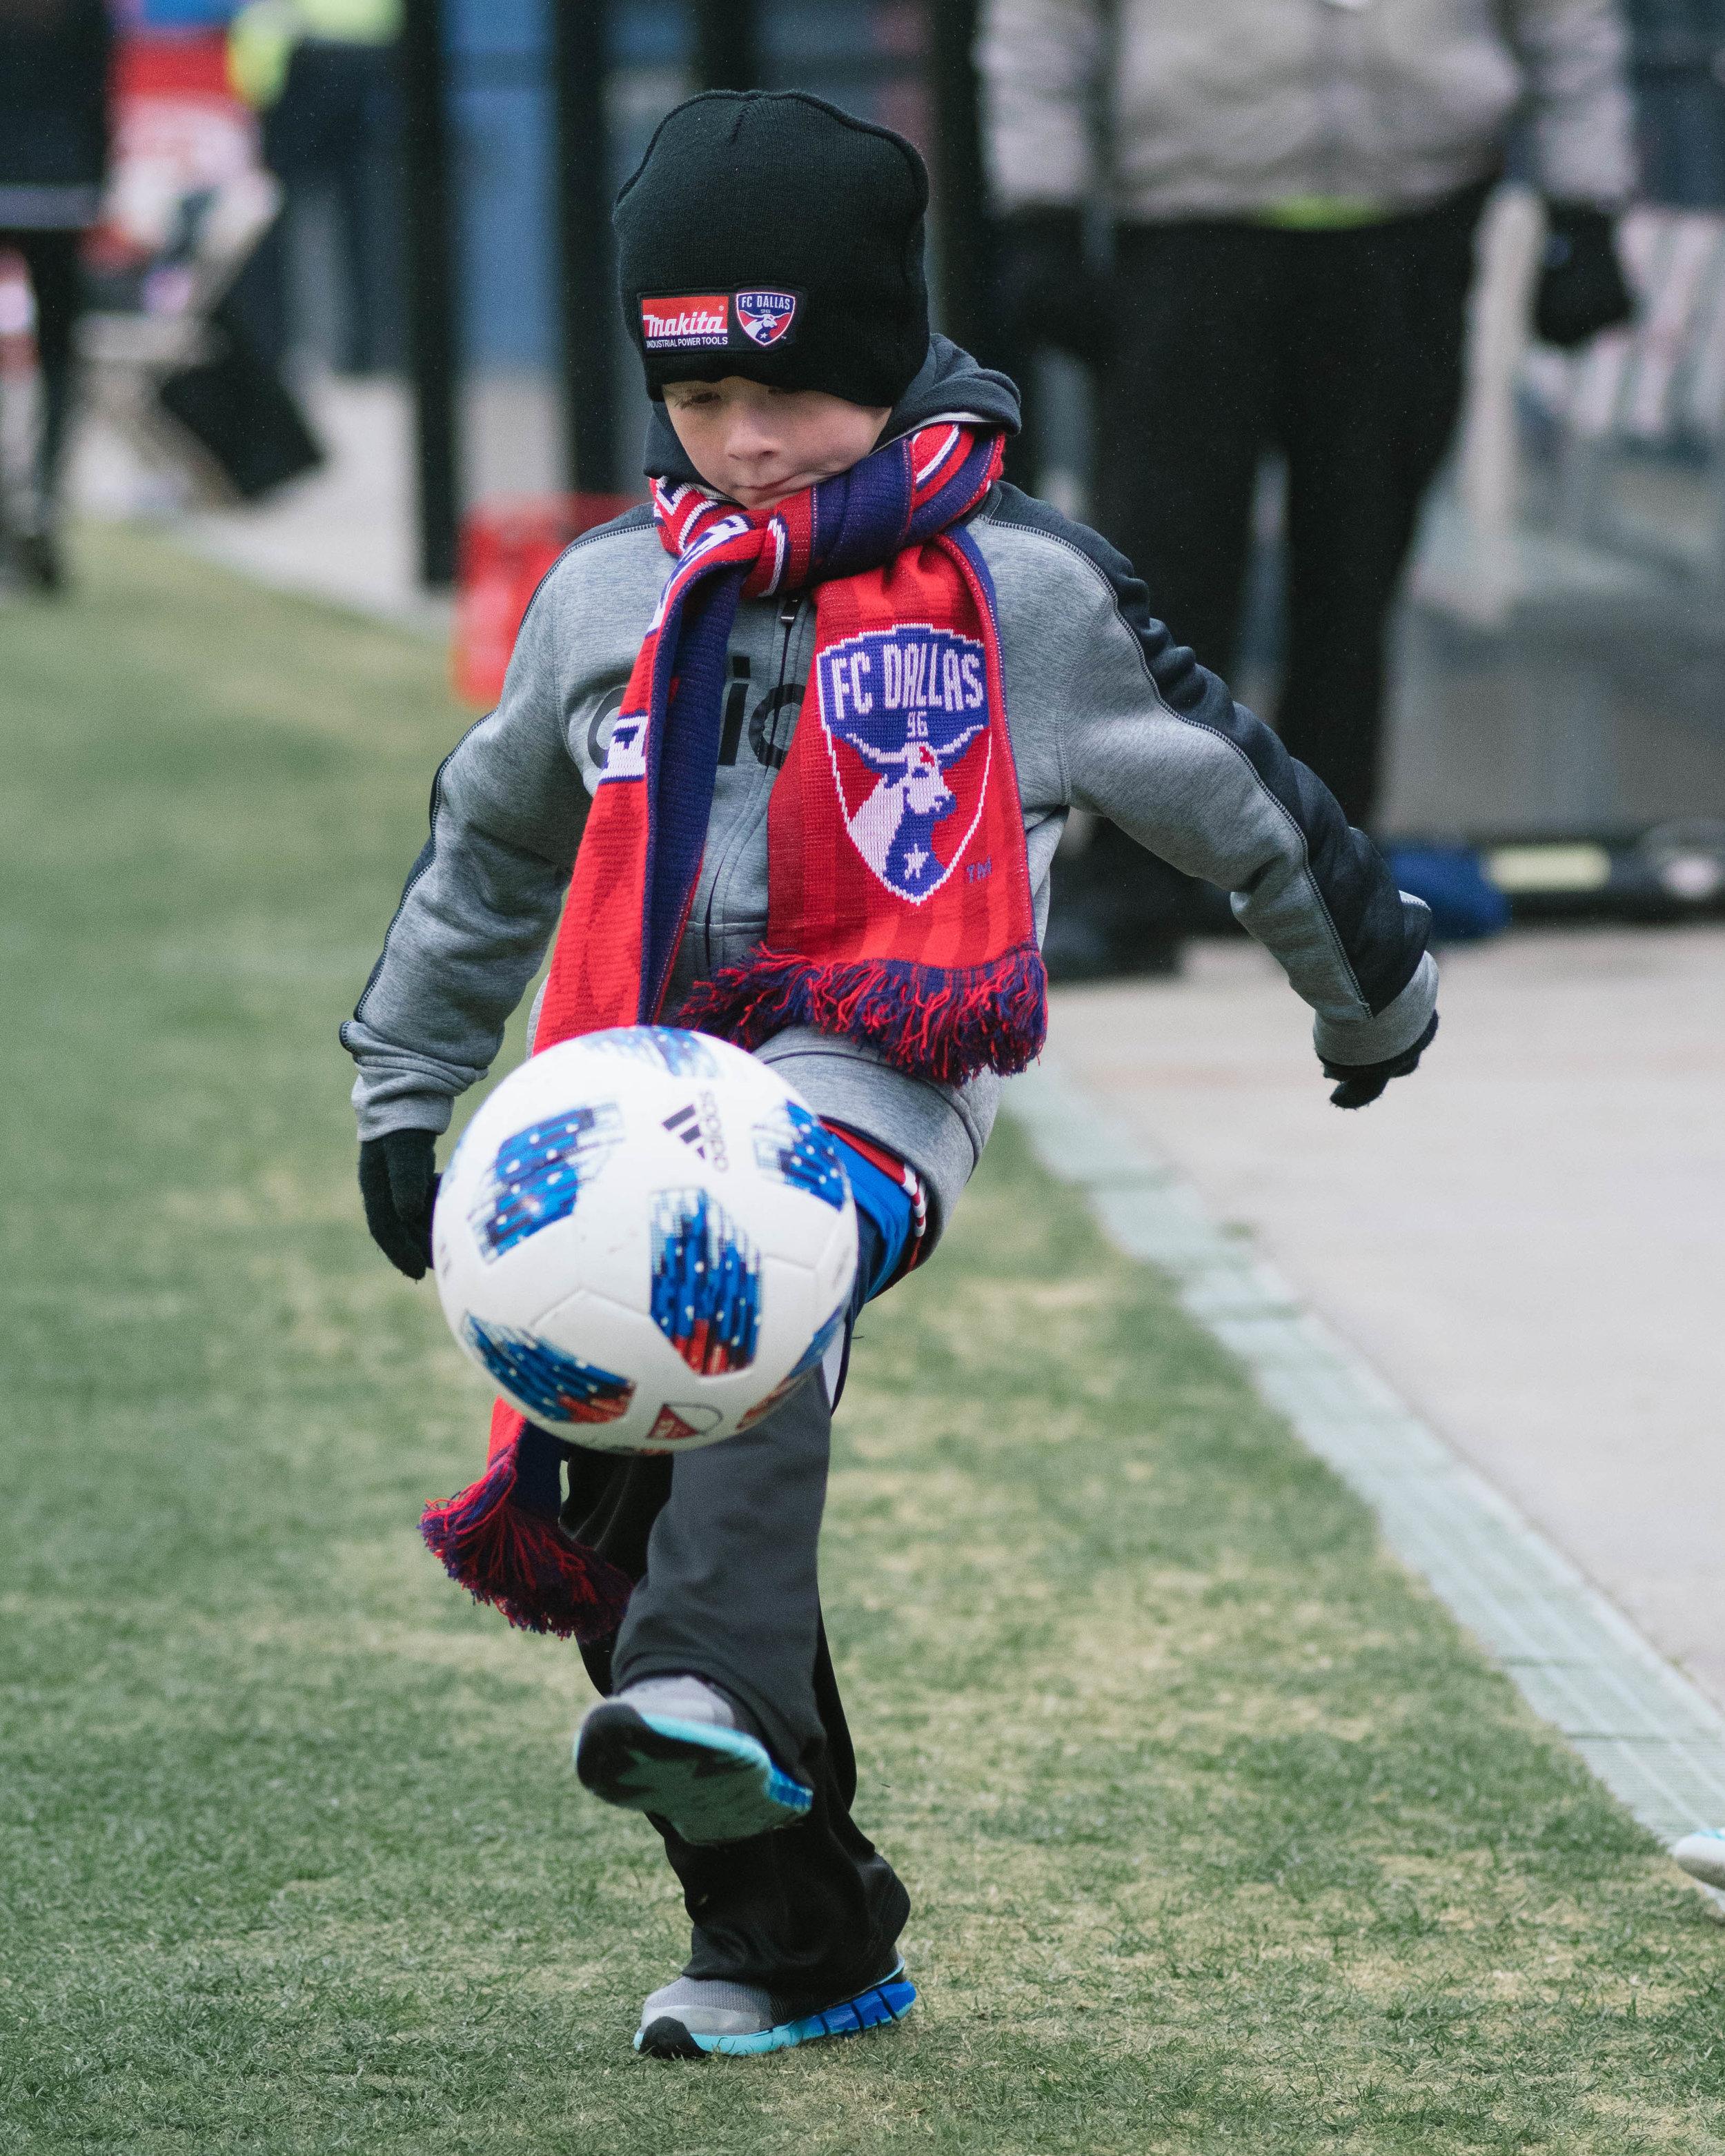 FC Dallas ball boy juggles a new MLS ball. |Shot with Nikon D500 w/ Nikkor 80-200 f2.8